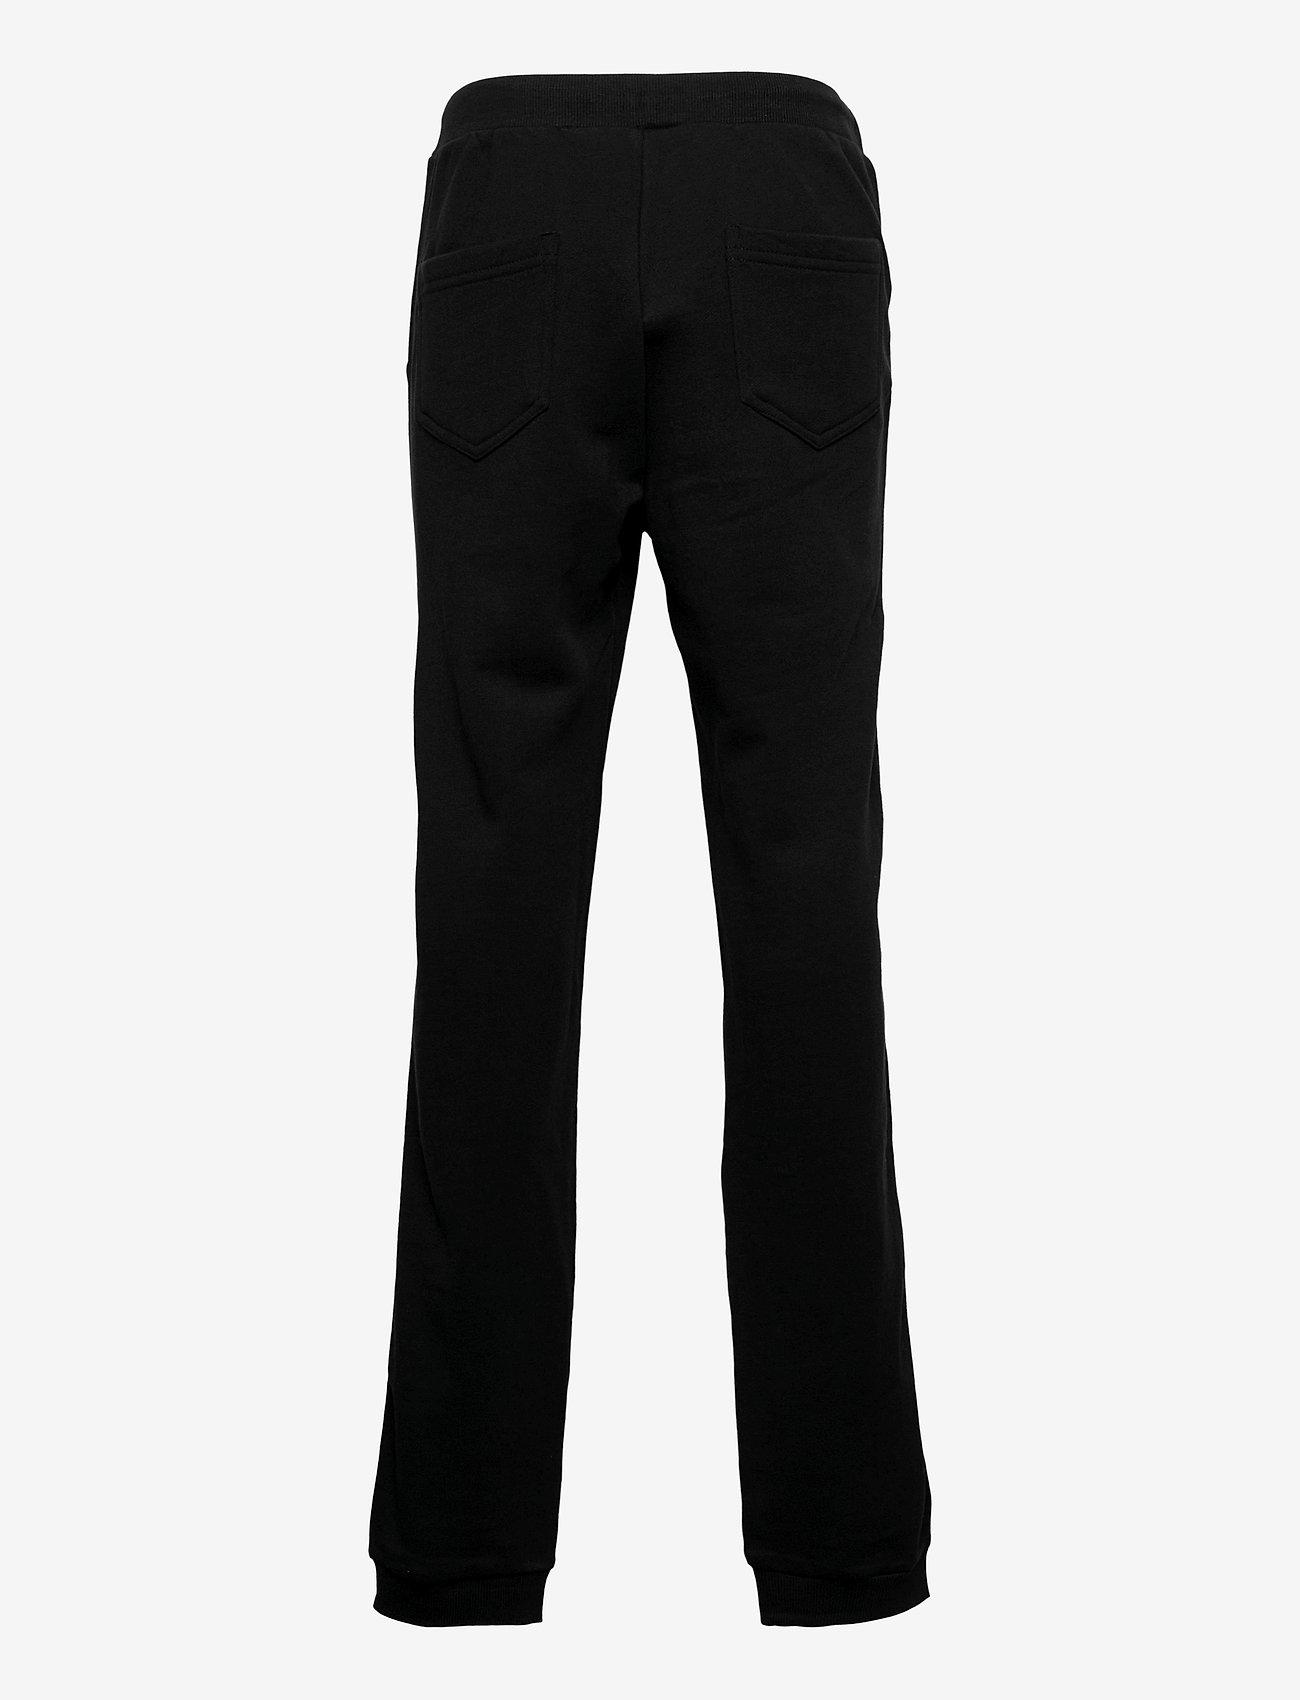 Diesel - PELINA TROUSERS - trousers - nero - 1